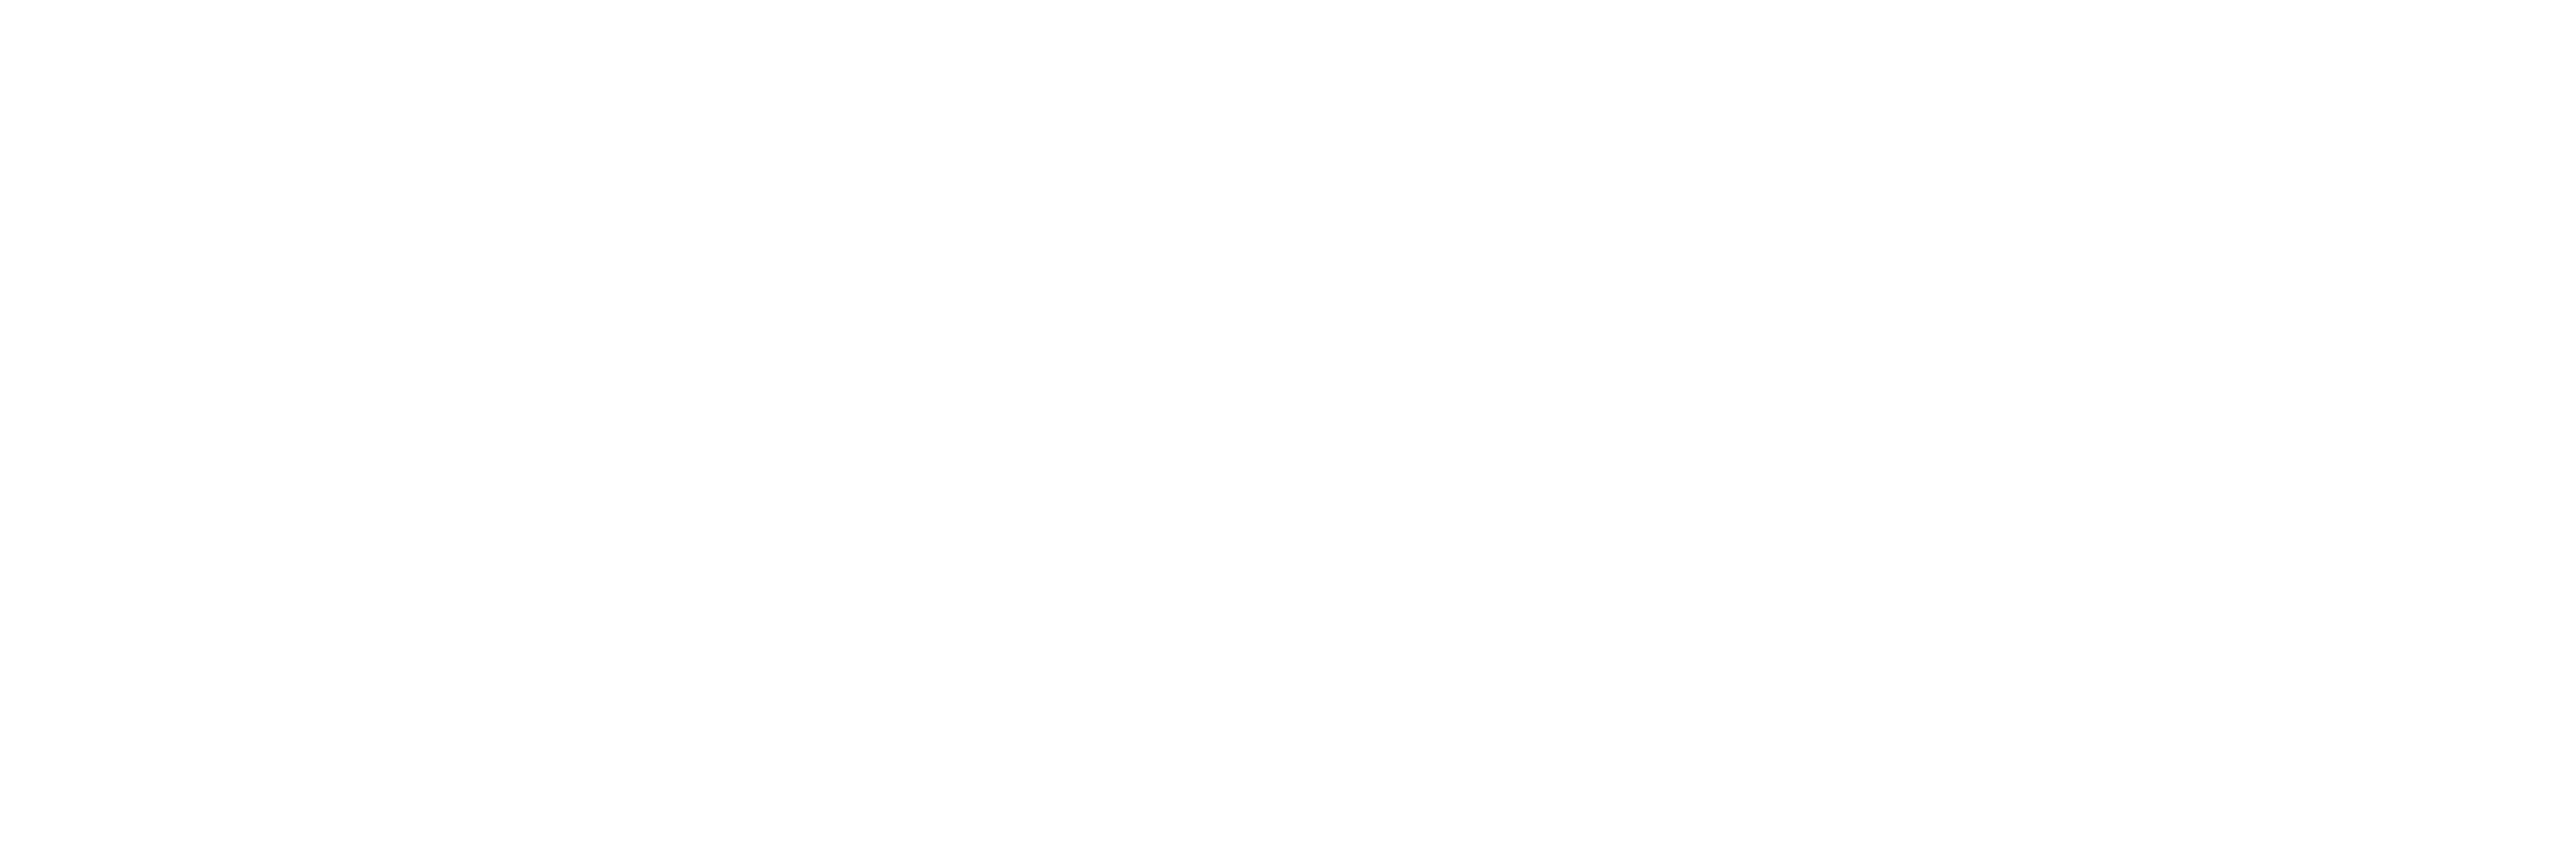 How Do I Release A Pet Prodigy